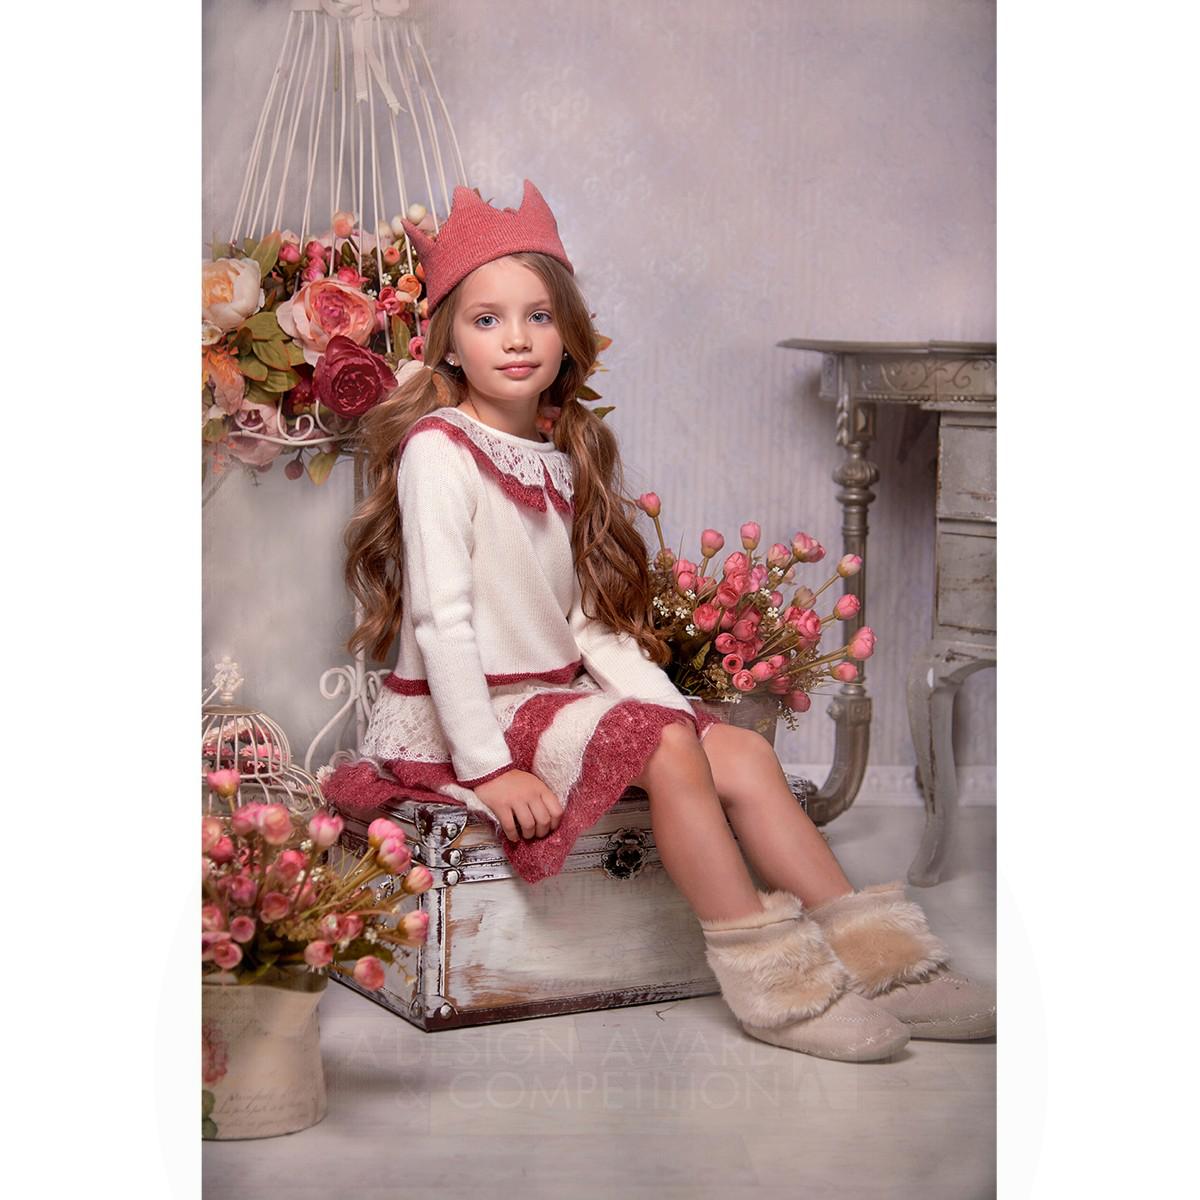 Lady Already Premium Brand for Kids